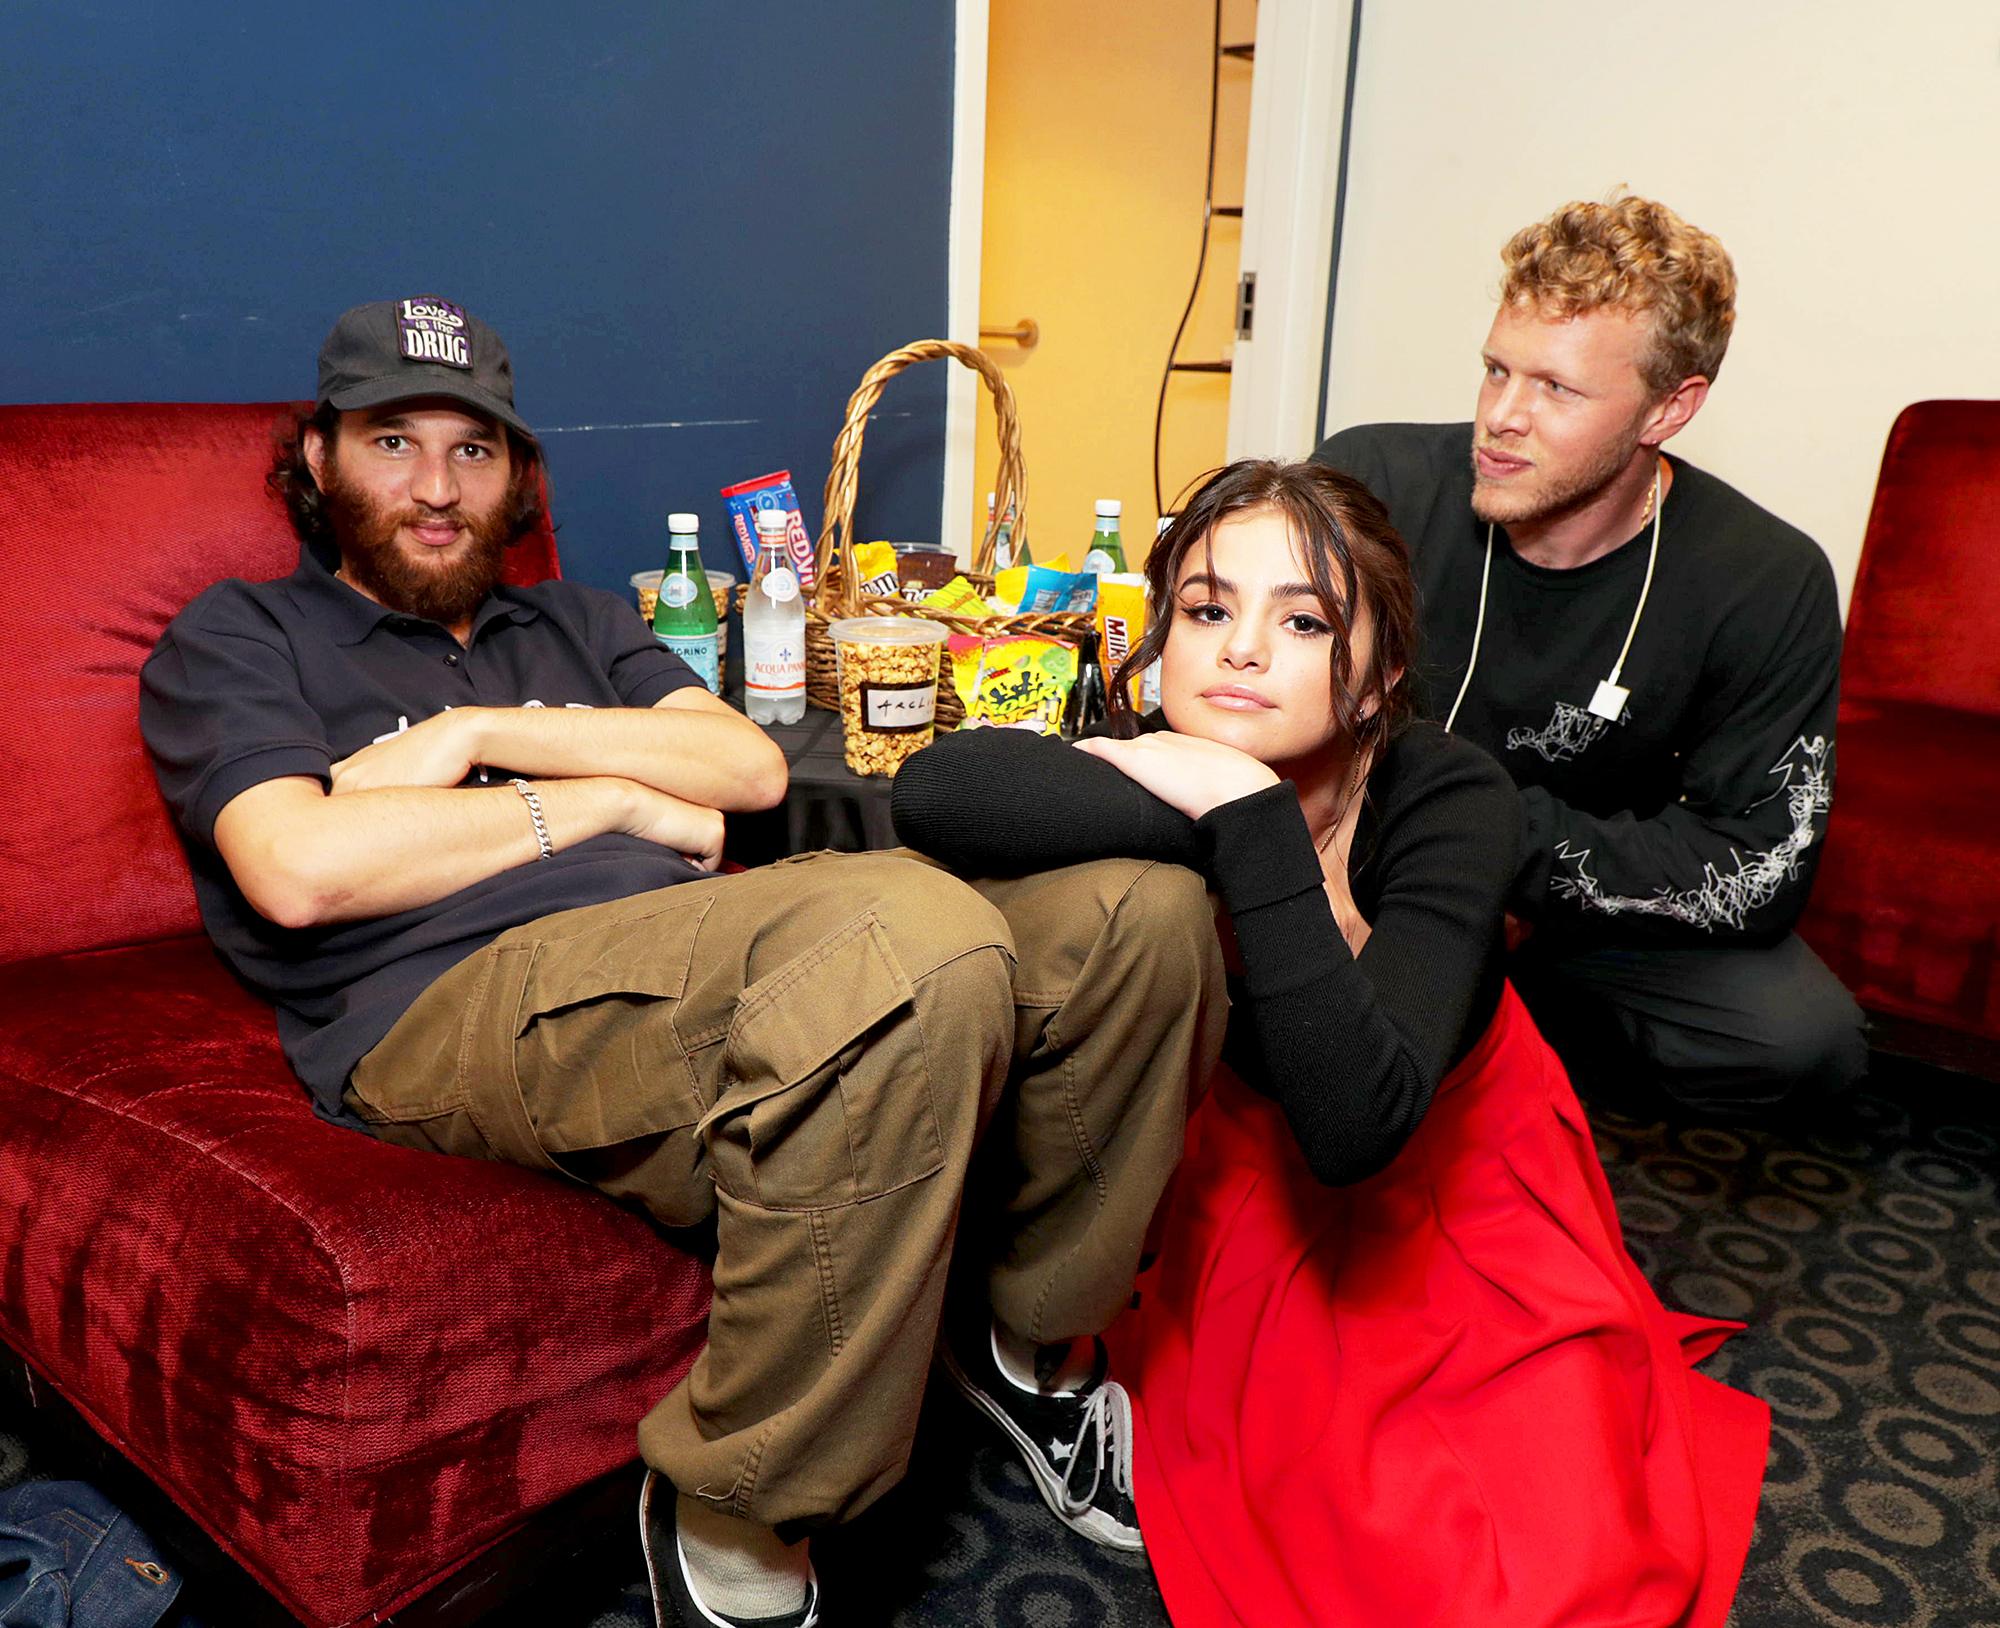 Joshua Safdie, Selena Gomez and Sebastian Bear-McClard